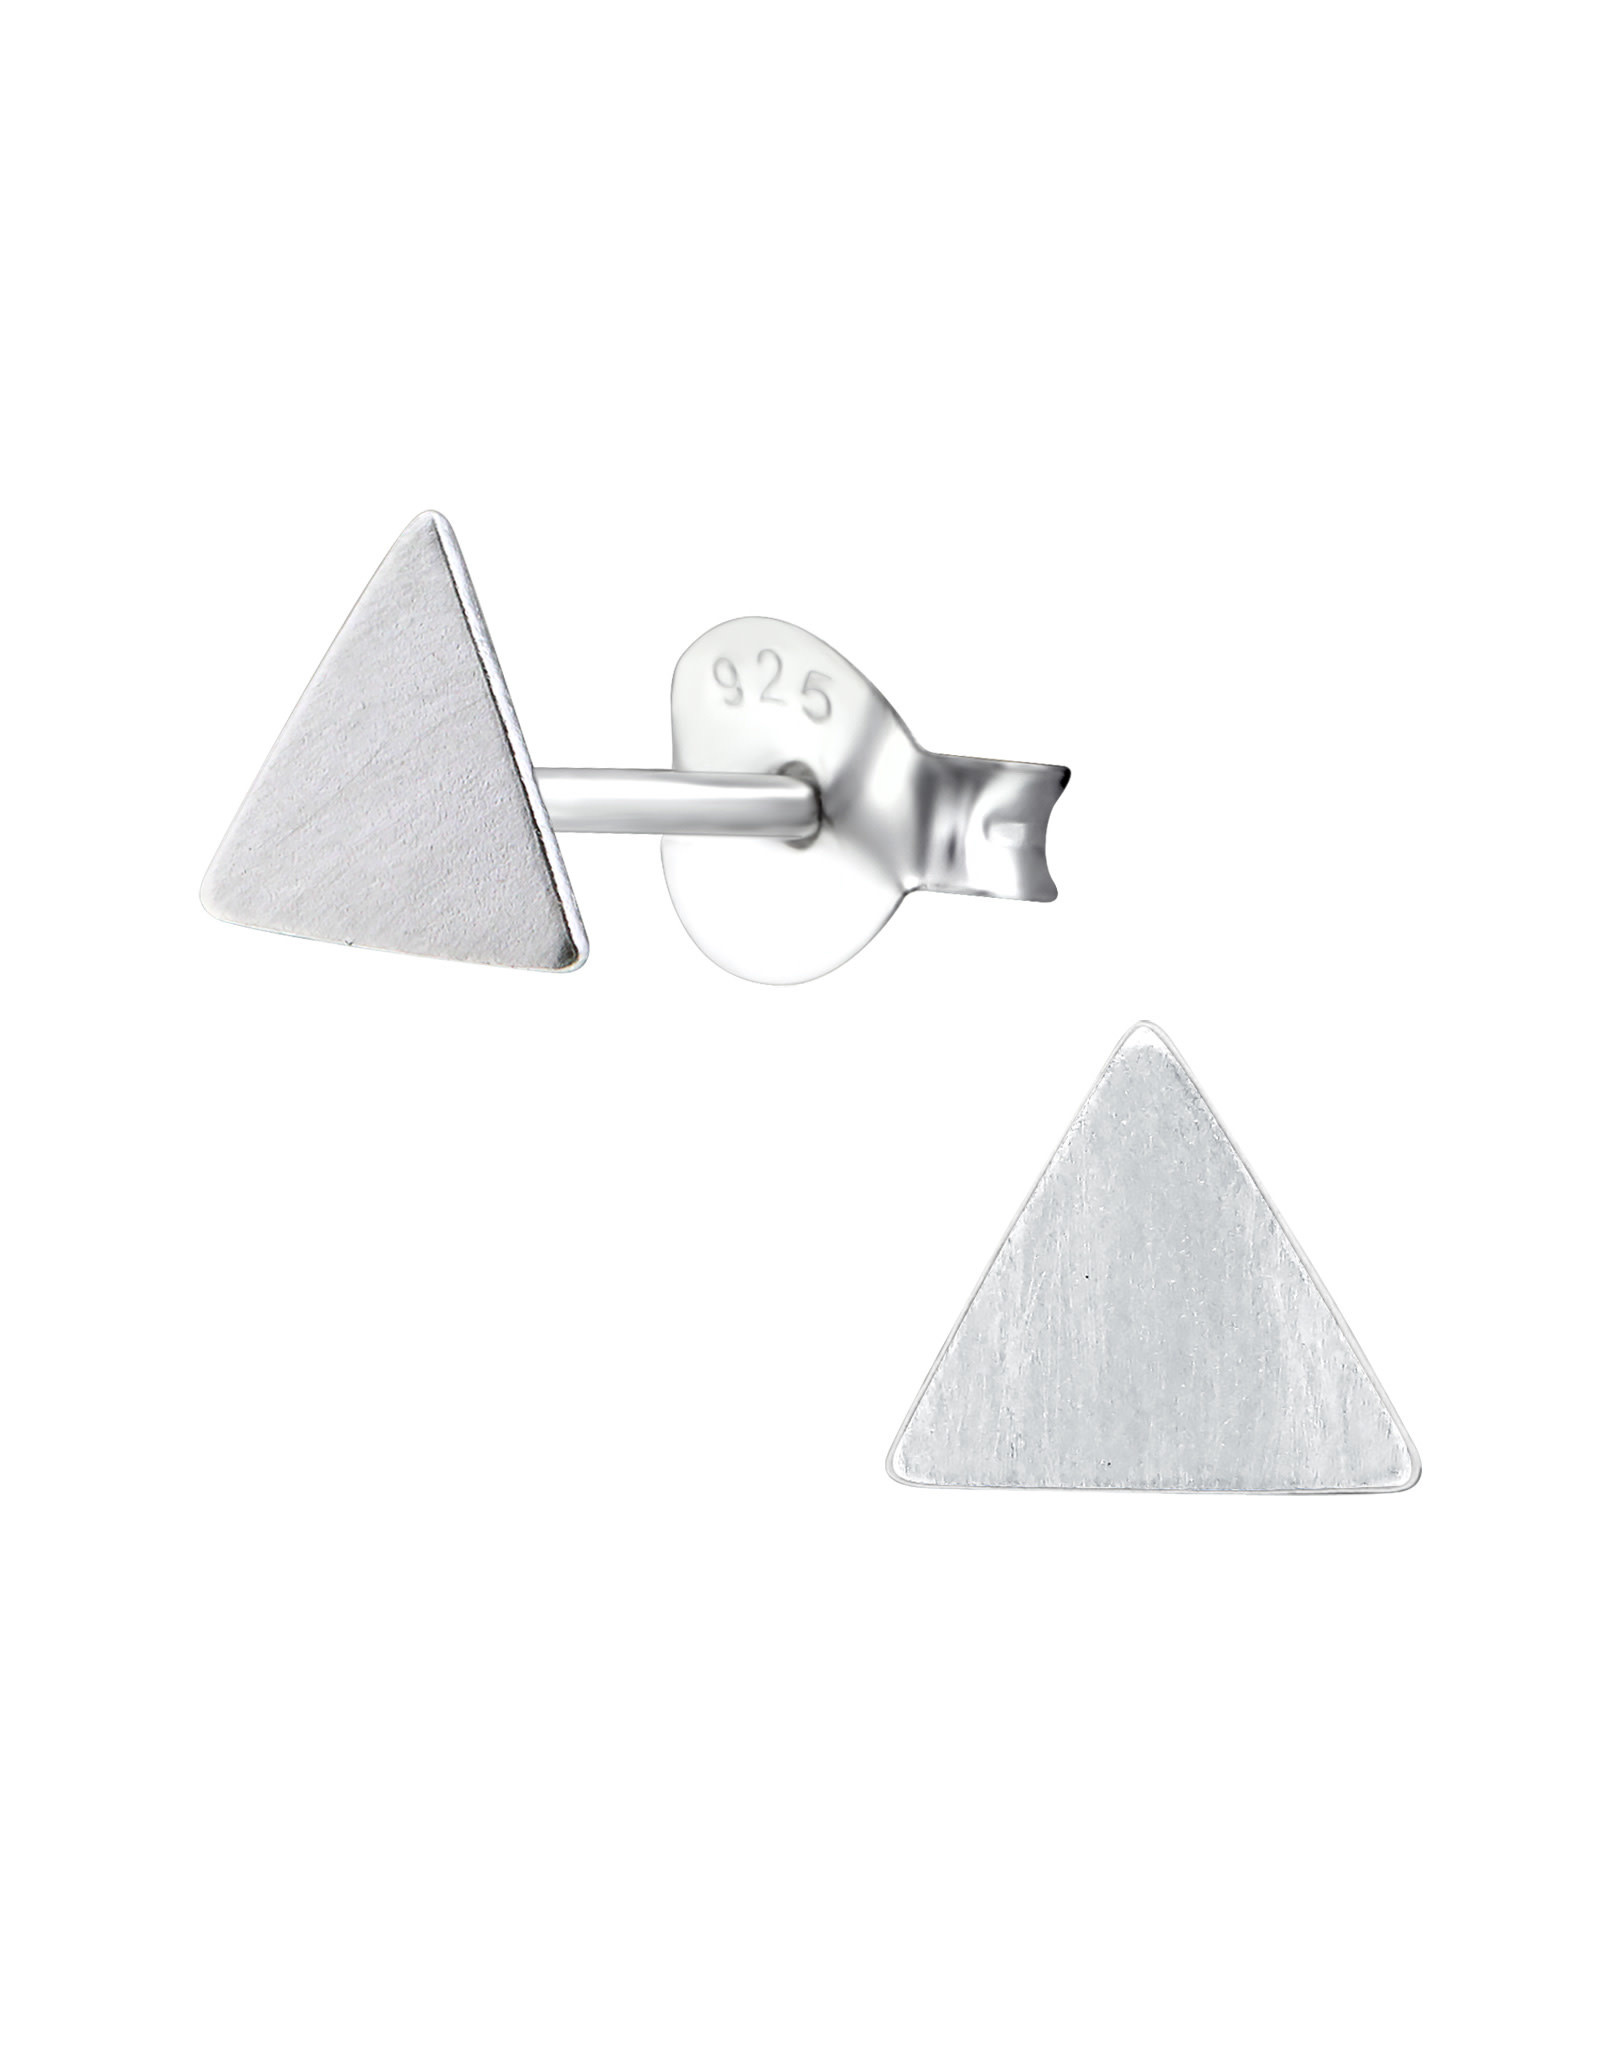 Stekertjes zilver driehoek mat